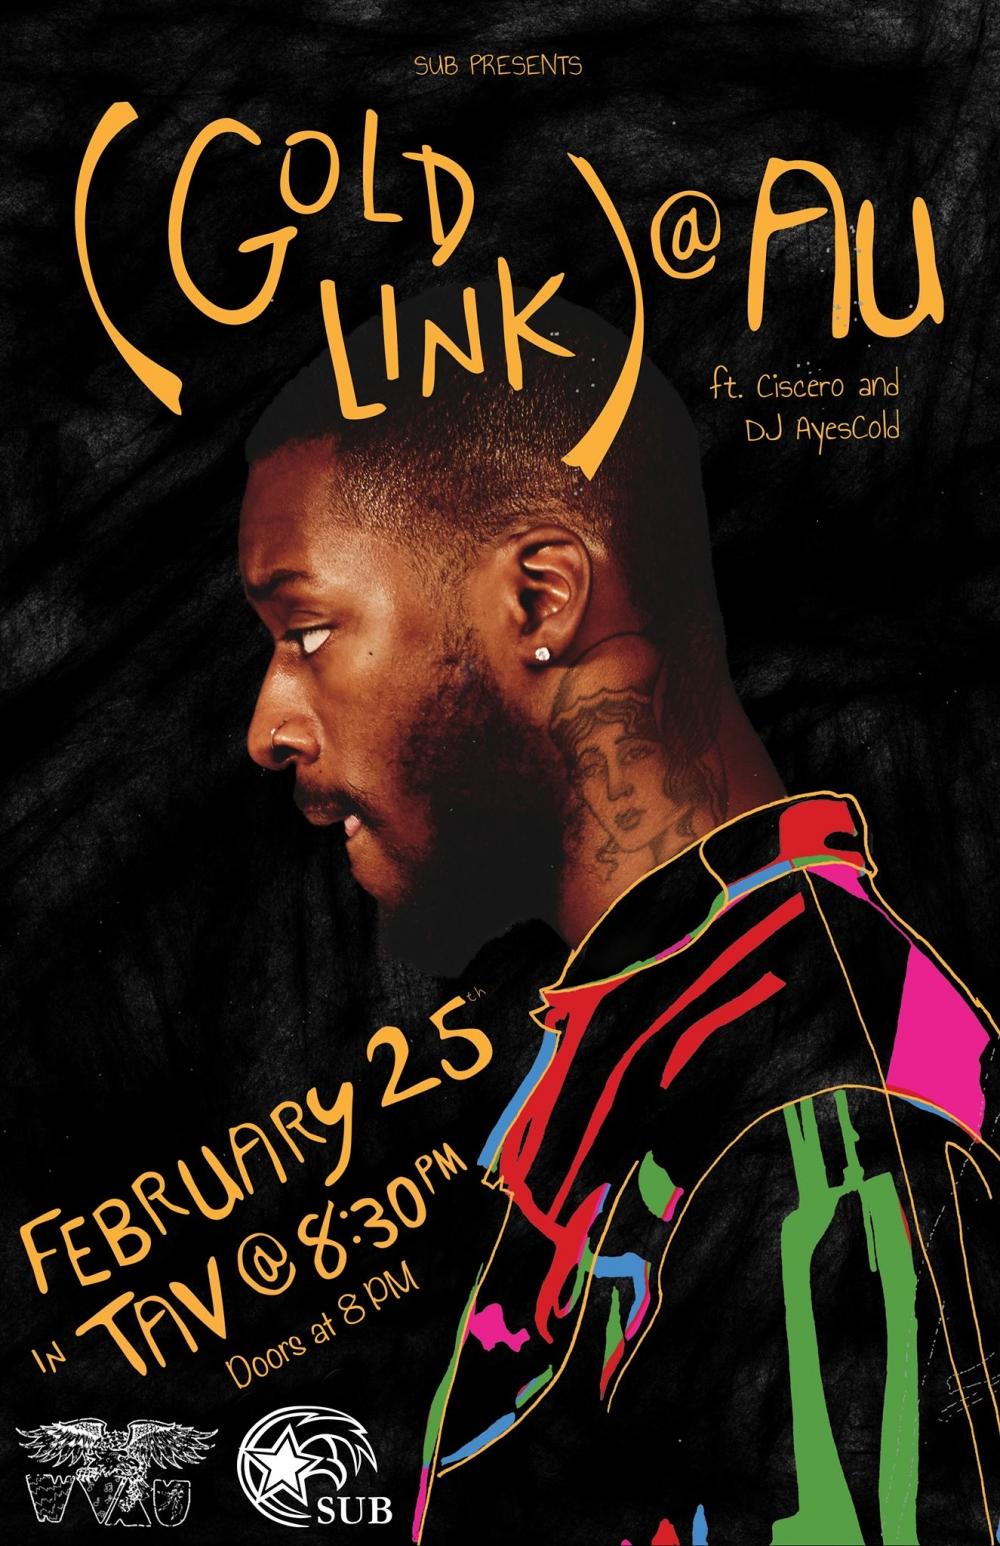 Goldlink to perform at SUB spring concert